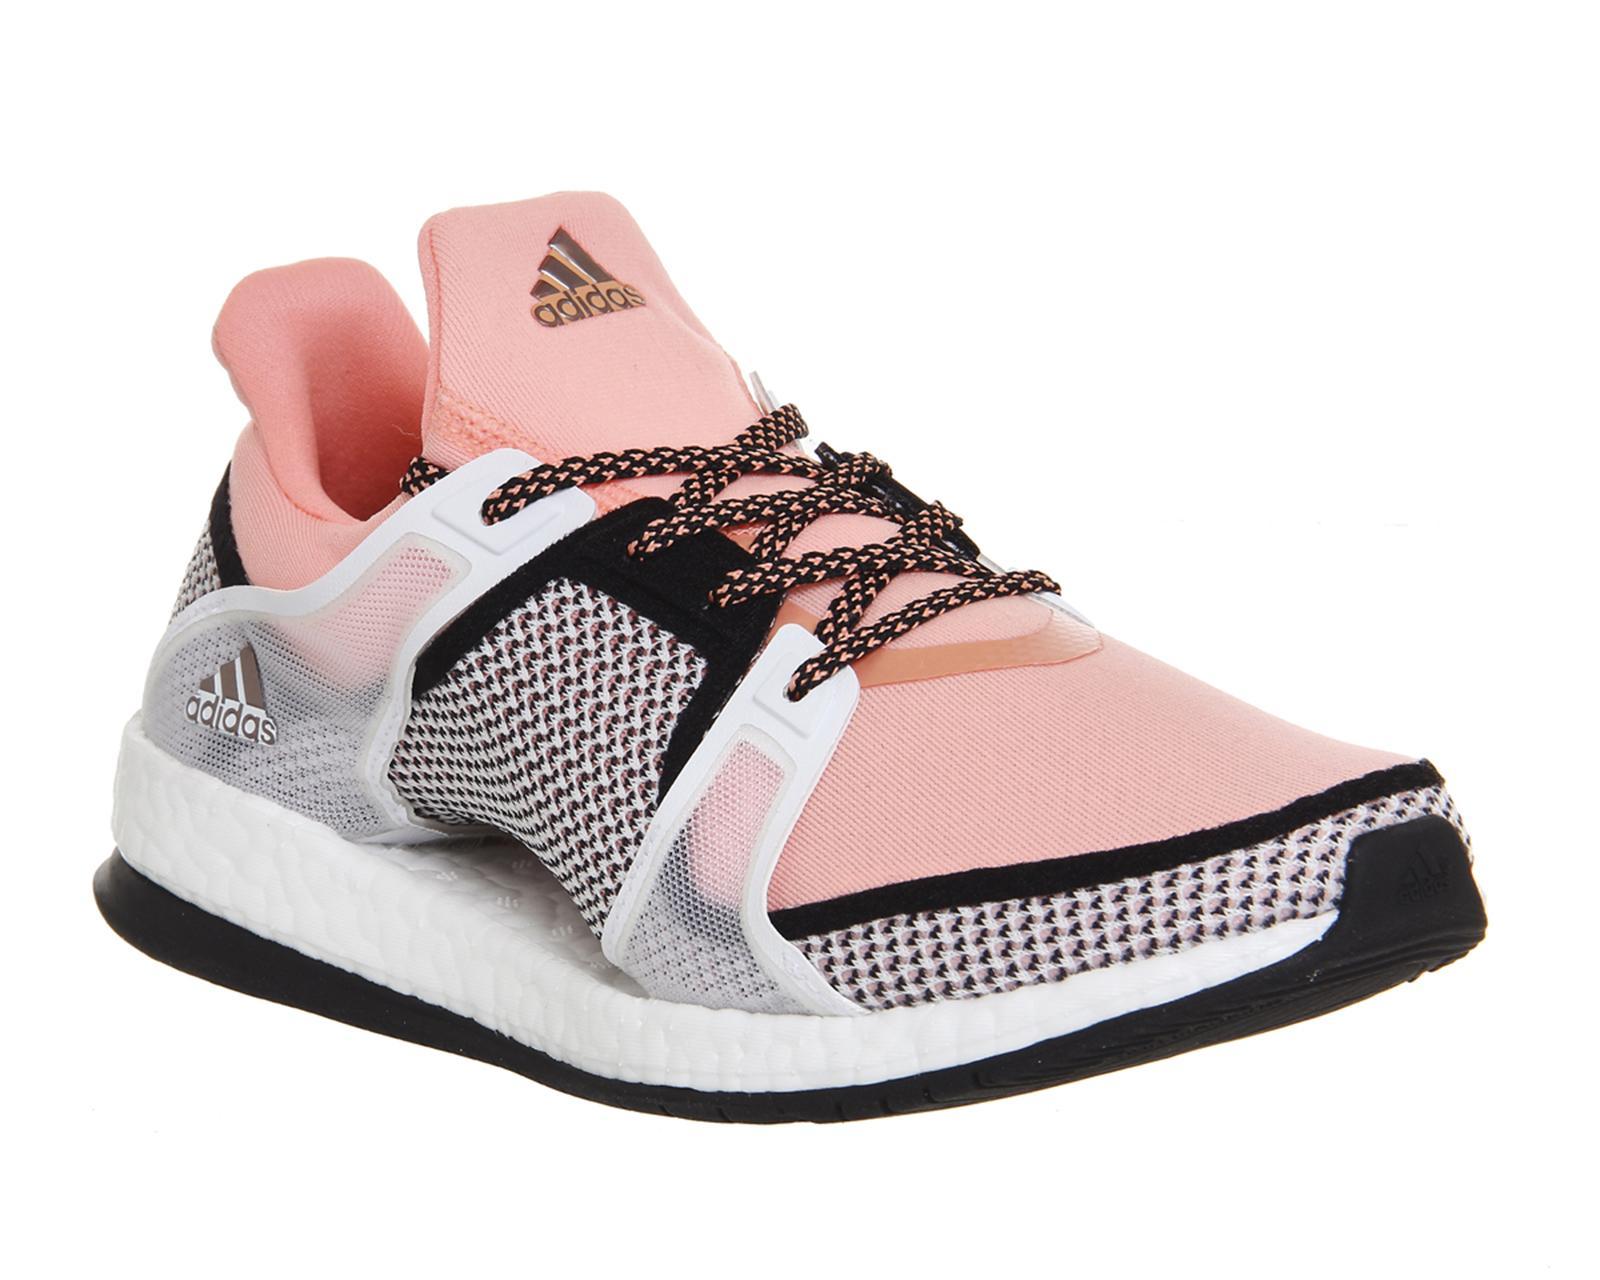 super popular 9fa9a c7cfc Lyst - adidas Originals Pure Boost X Tr in Pink